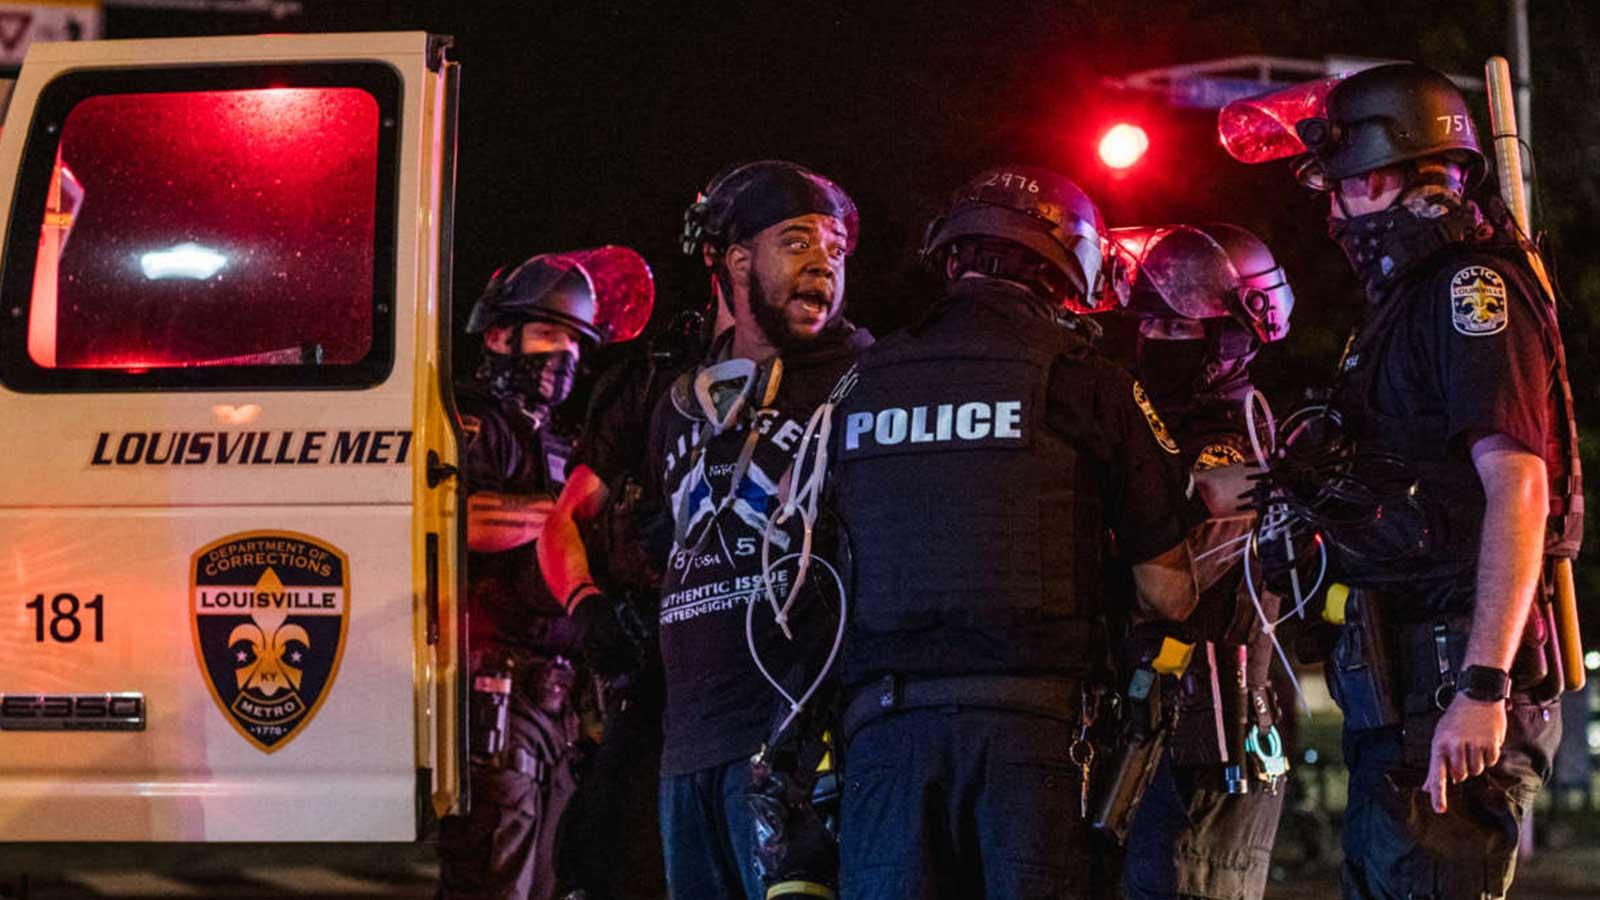 A demonstrator is arrested on September 26, 2020, in Louisville, Kentucky.